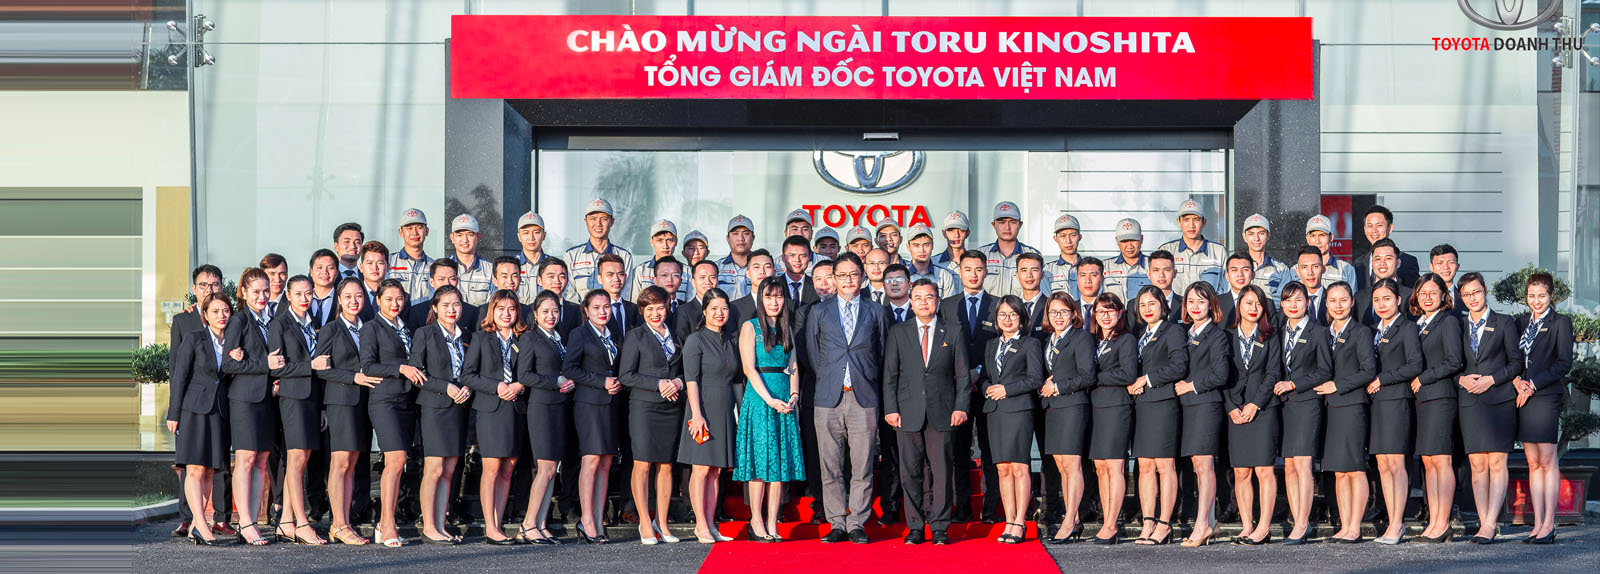 toyota doanh thu thanh hoa - Giới thiệu Toyota Việt Nam